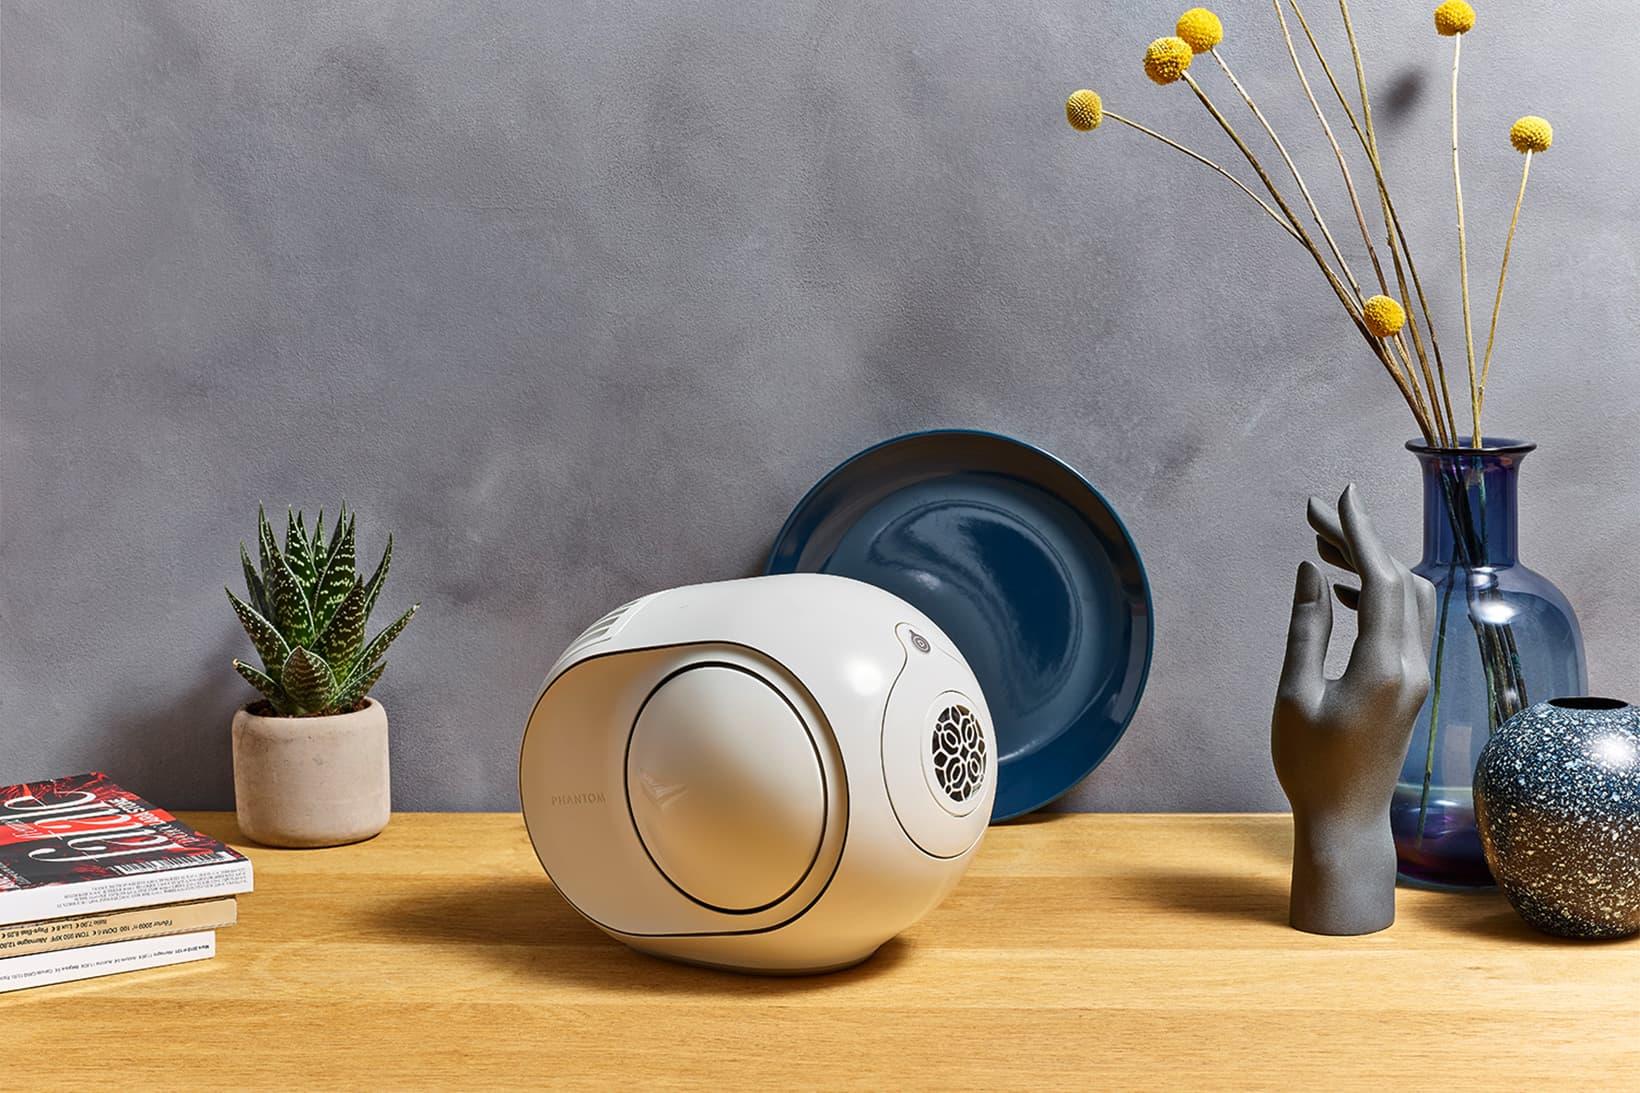 The Devialet Phantom Reactor Speaker is Designed to Recreate the Concert Experience